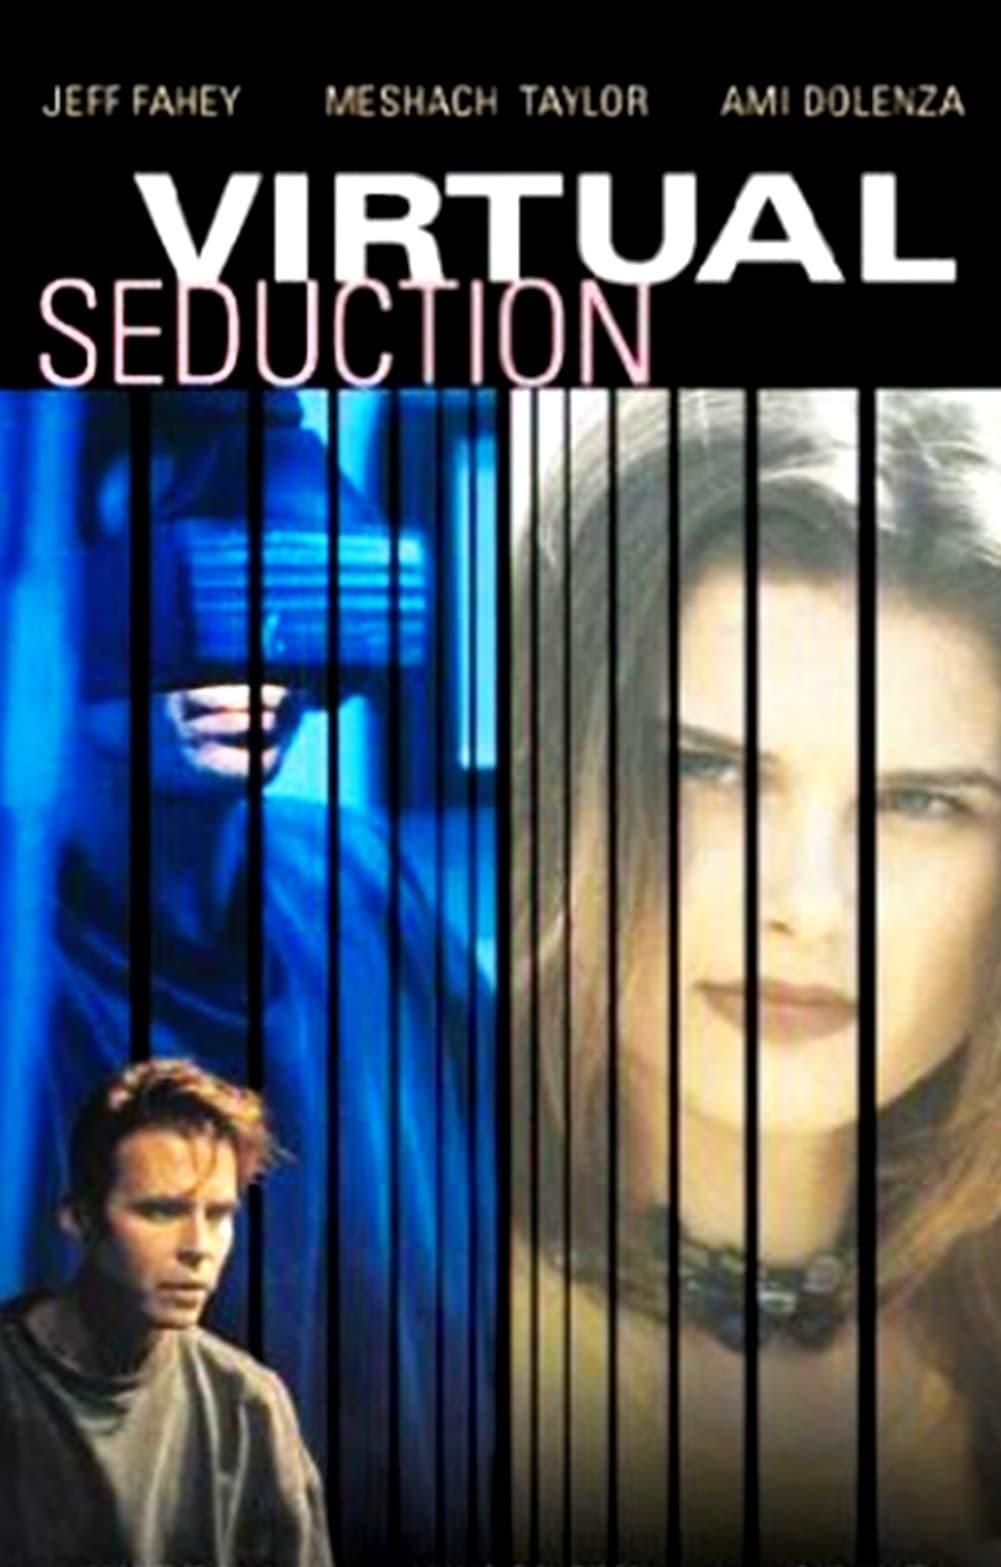 Virtual Seduction